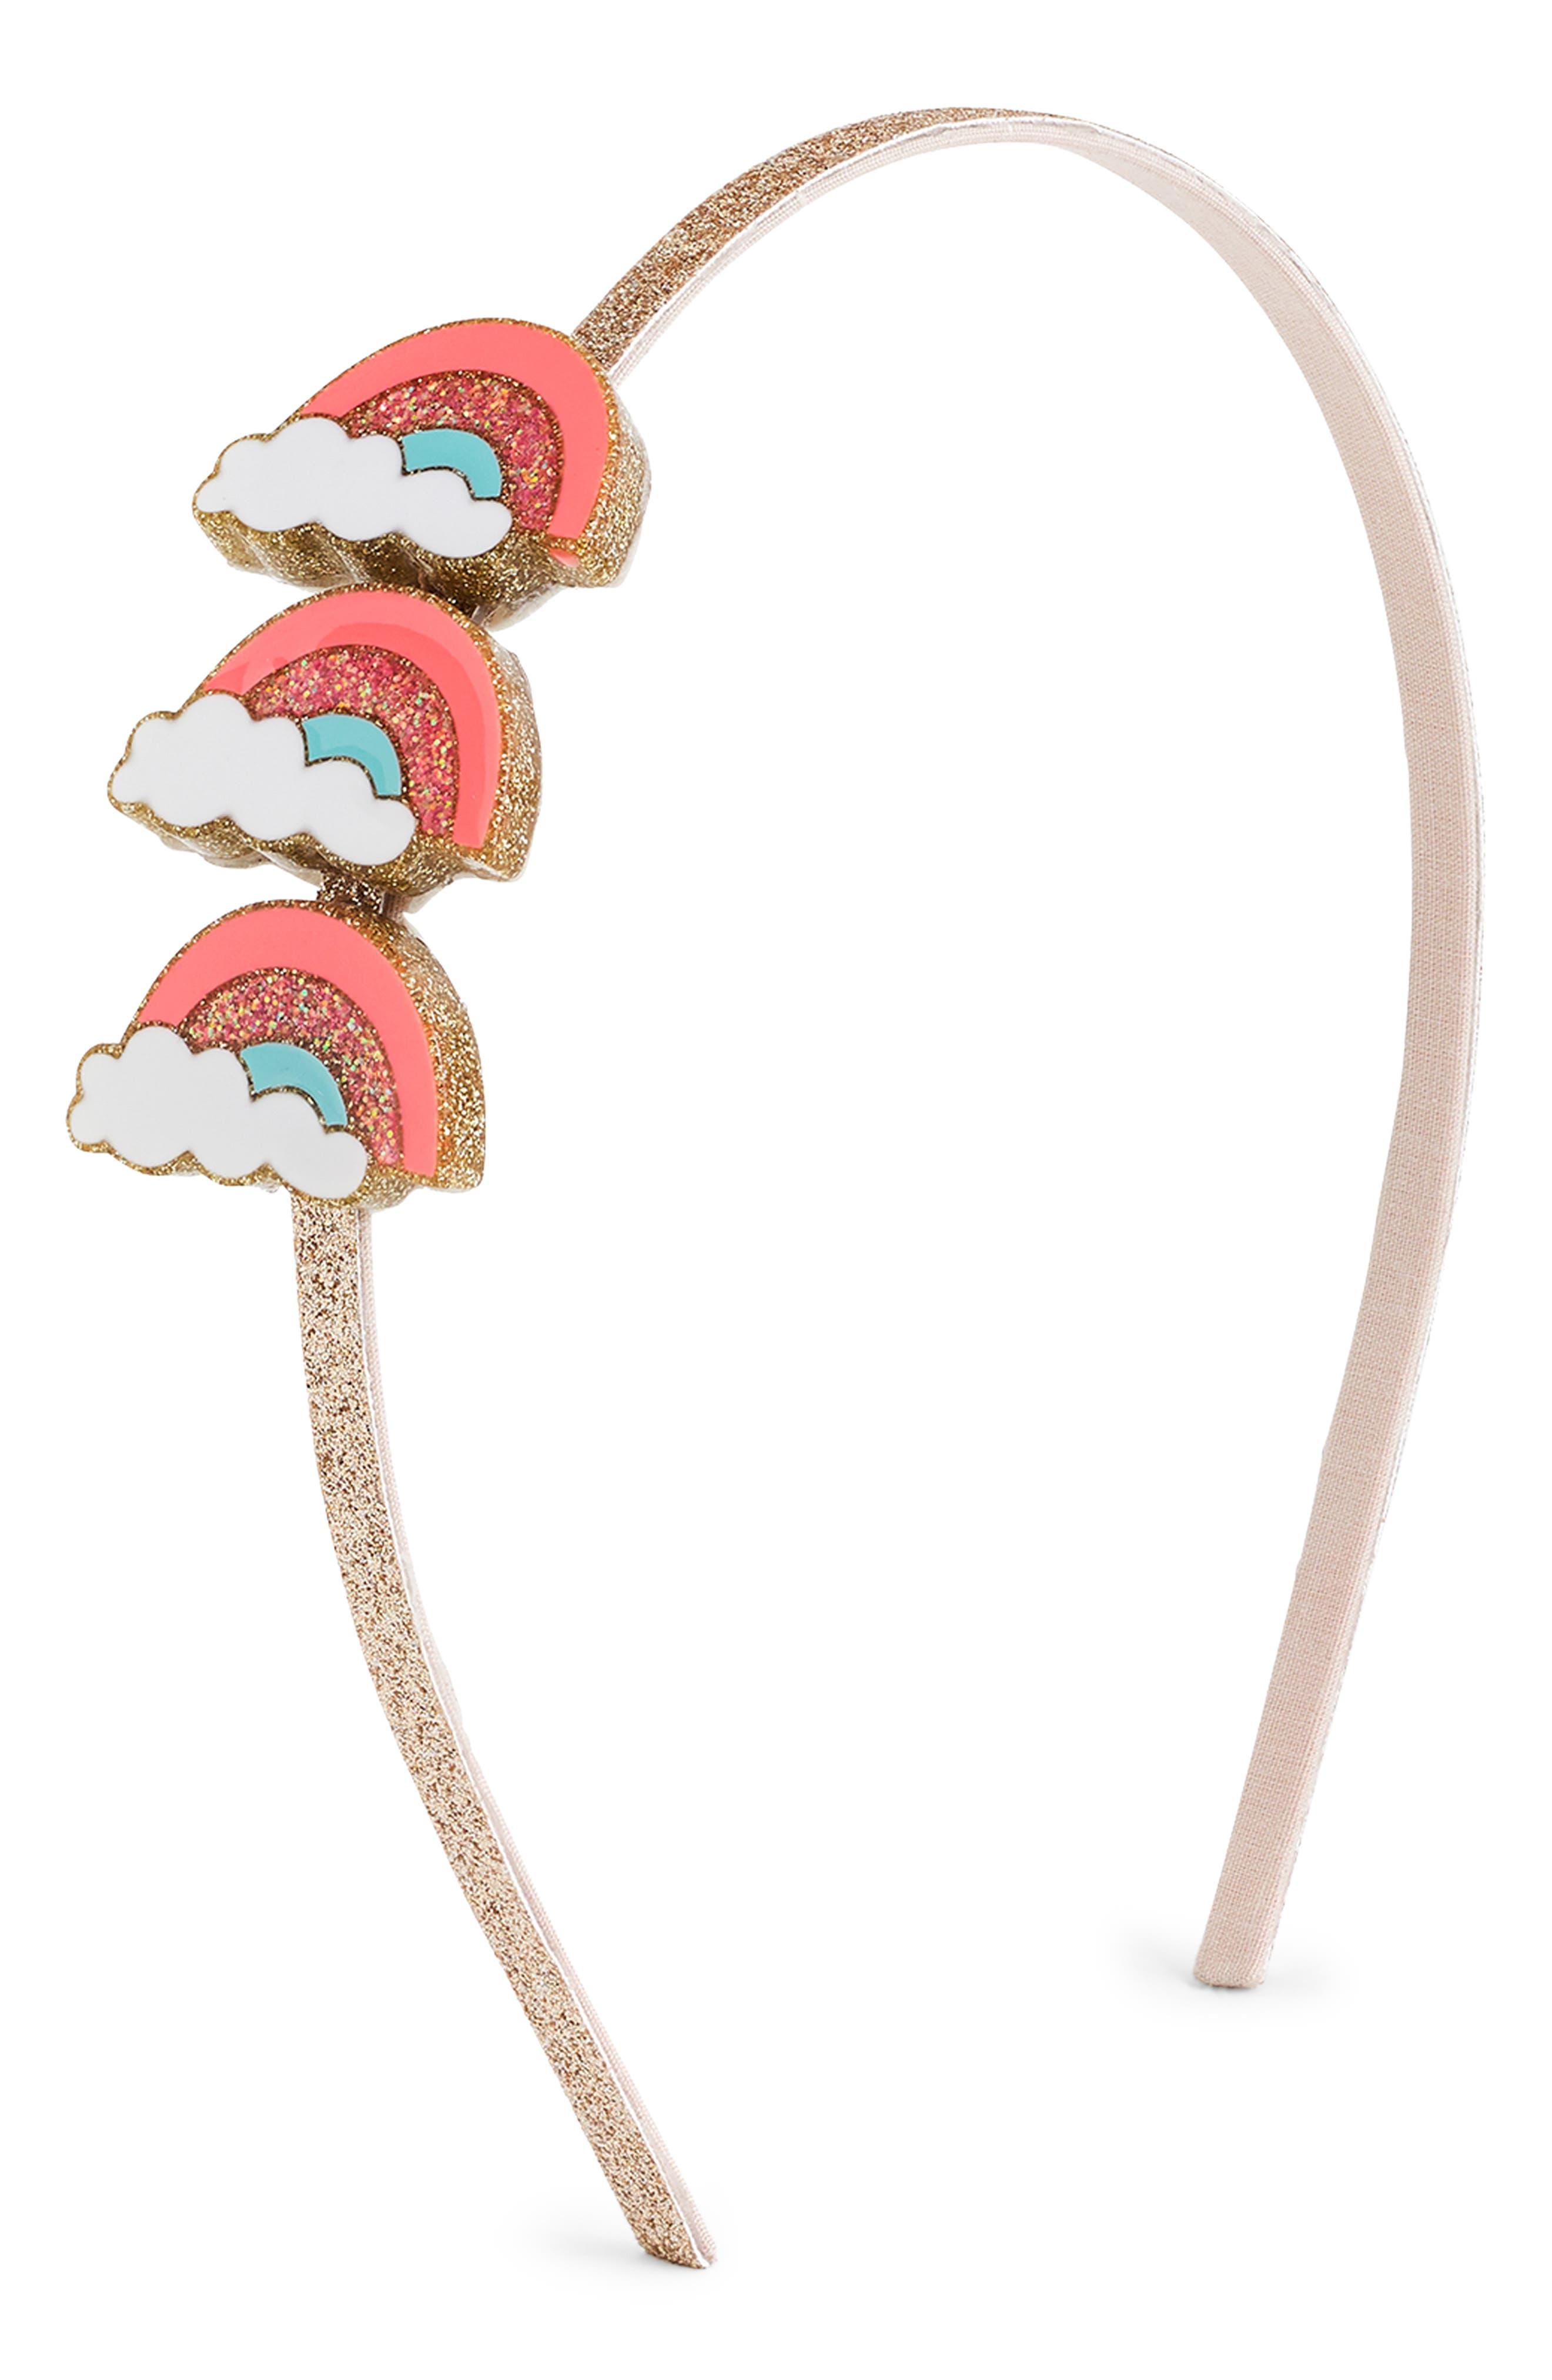 Crewcuts By Jcrew Rainbow Headband Size One Size  Pink